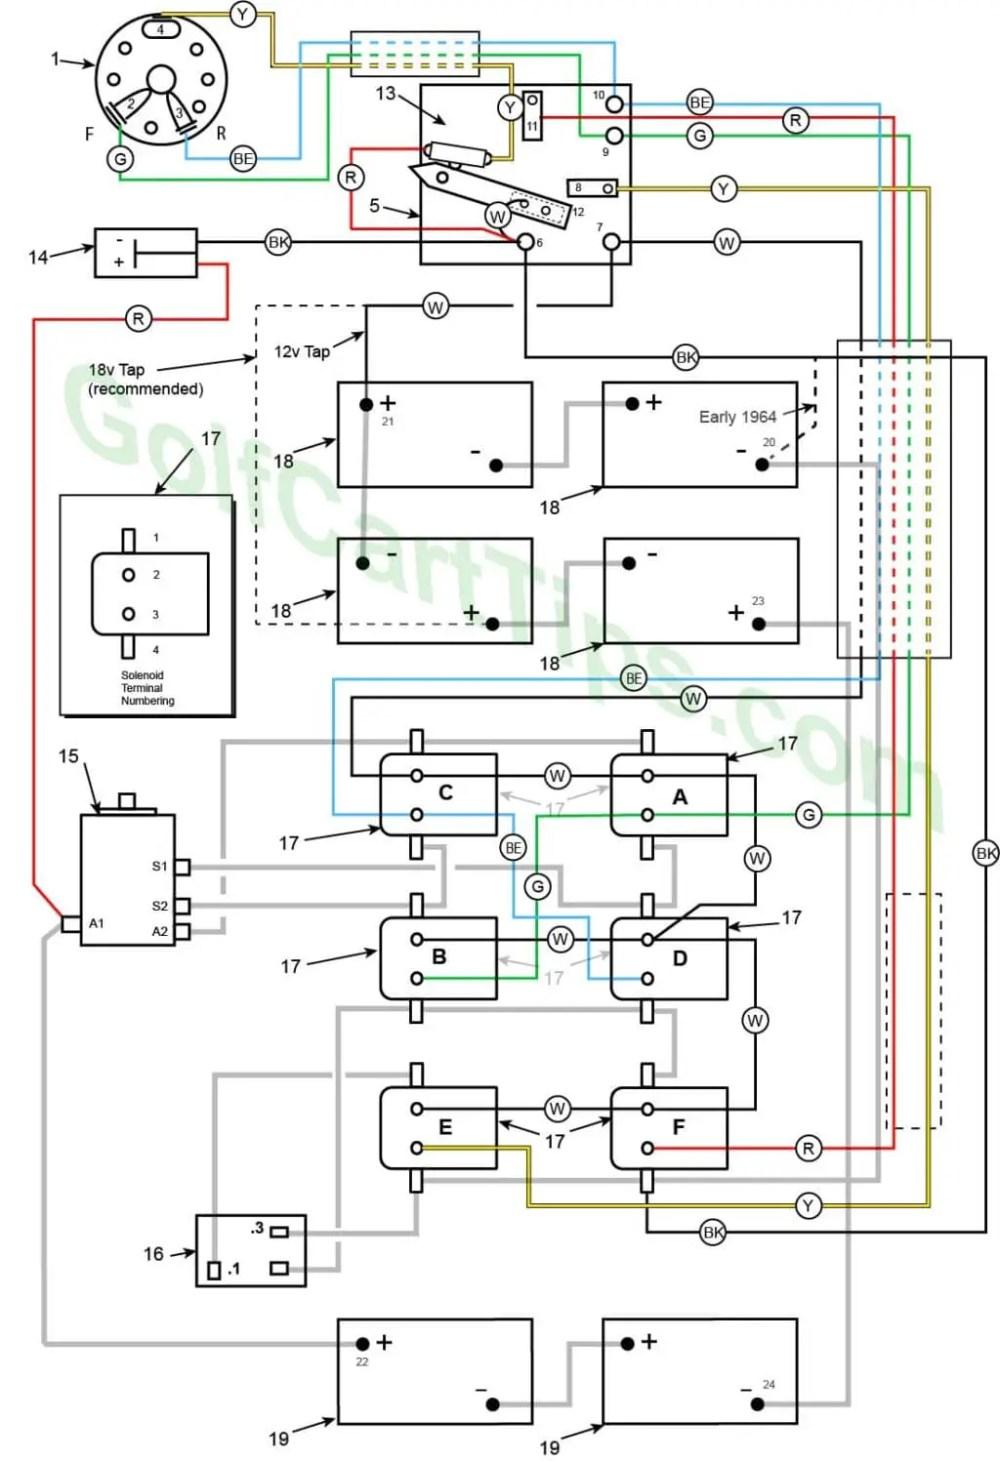 medium resolution of 1963 65 model de control circuit wiring diagram for 16 gauge wire